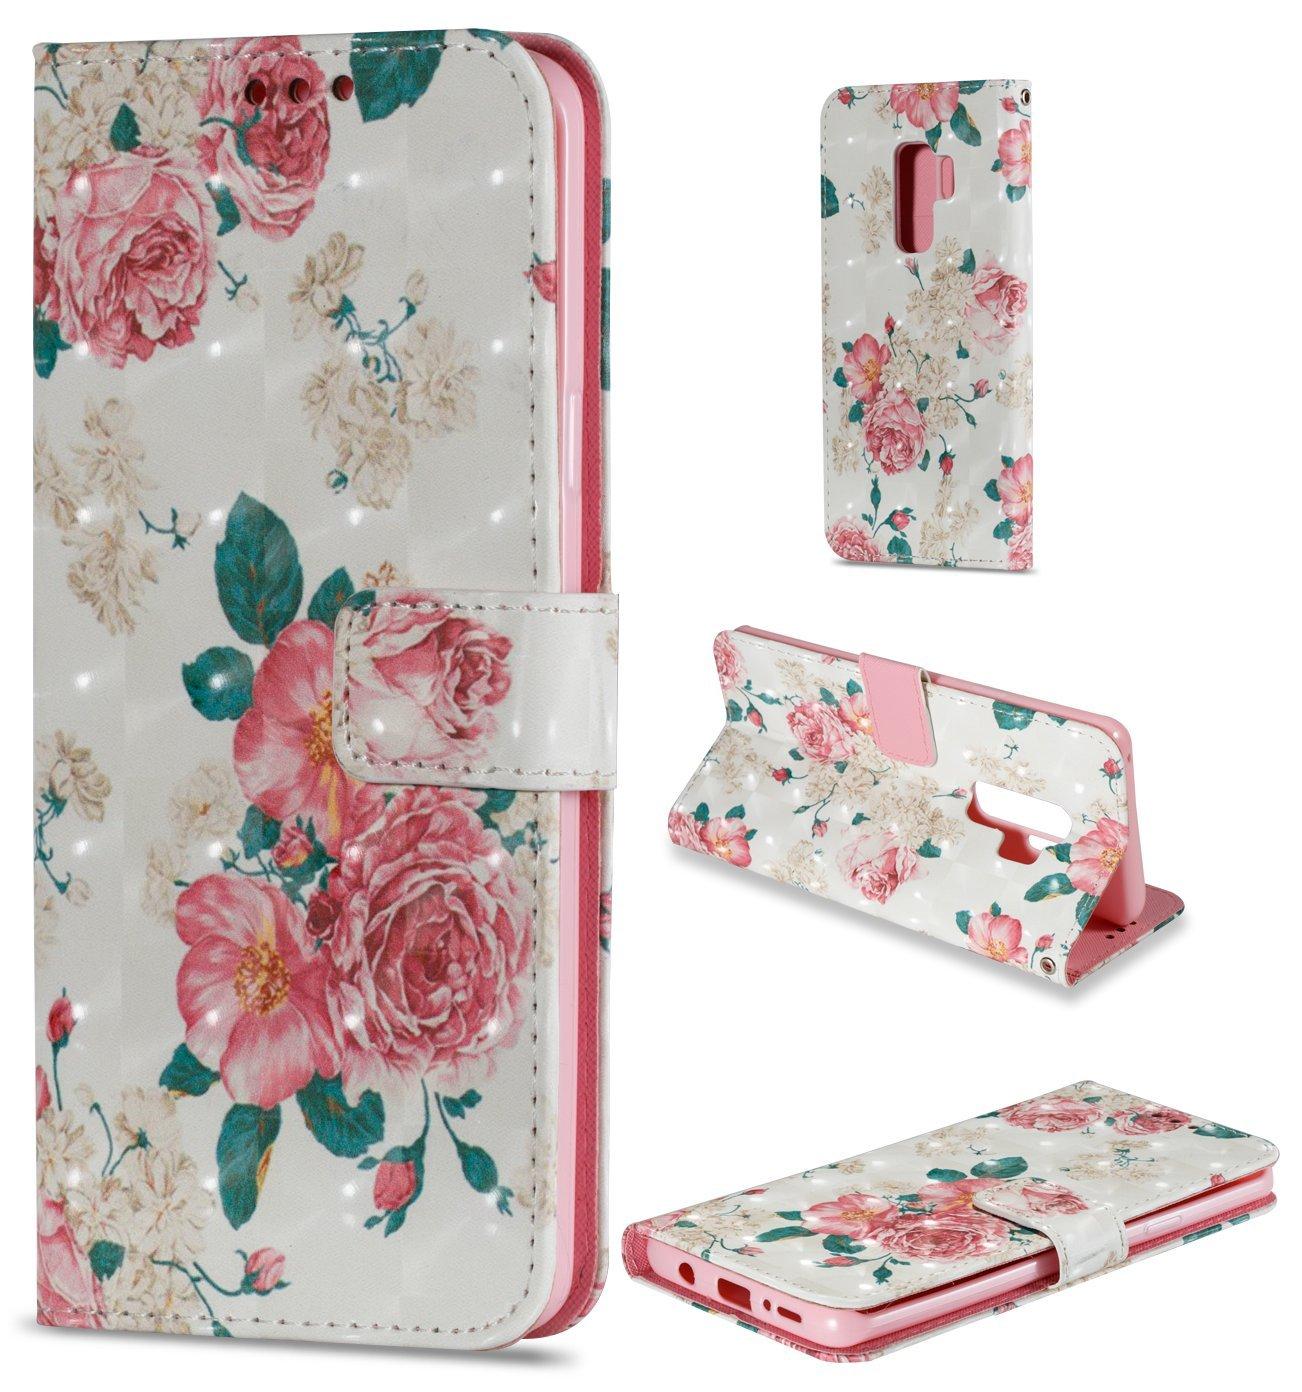 Amazon.com: Samsung Apple iPhone LG Sony Motorola Moto Phone ...